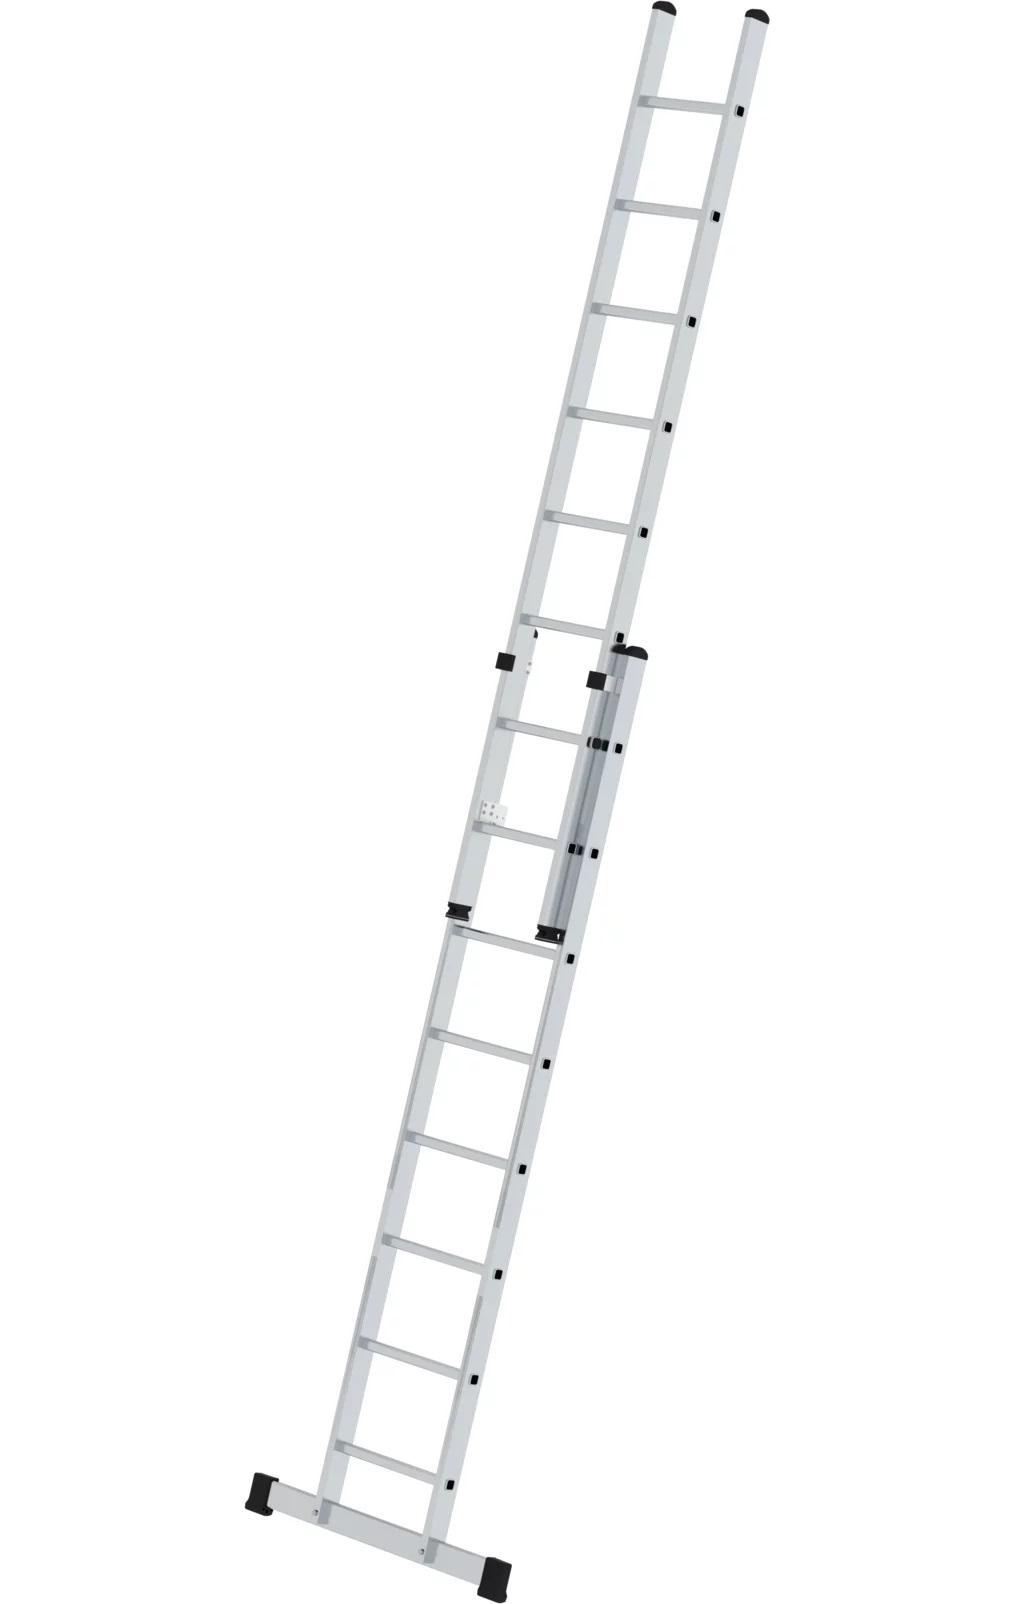 Tweedelige opsteekladder, Standaard stabilisatiebalk, 2x8, 20808